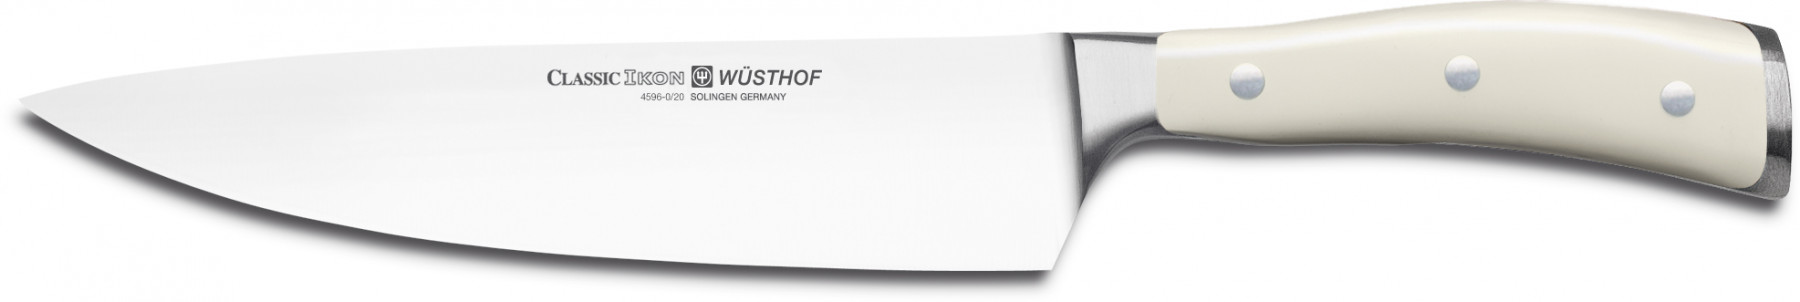 Wüsthof Dreizack Classic Ikon Creme Messerblock 7tlg. Kochmesser